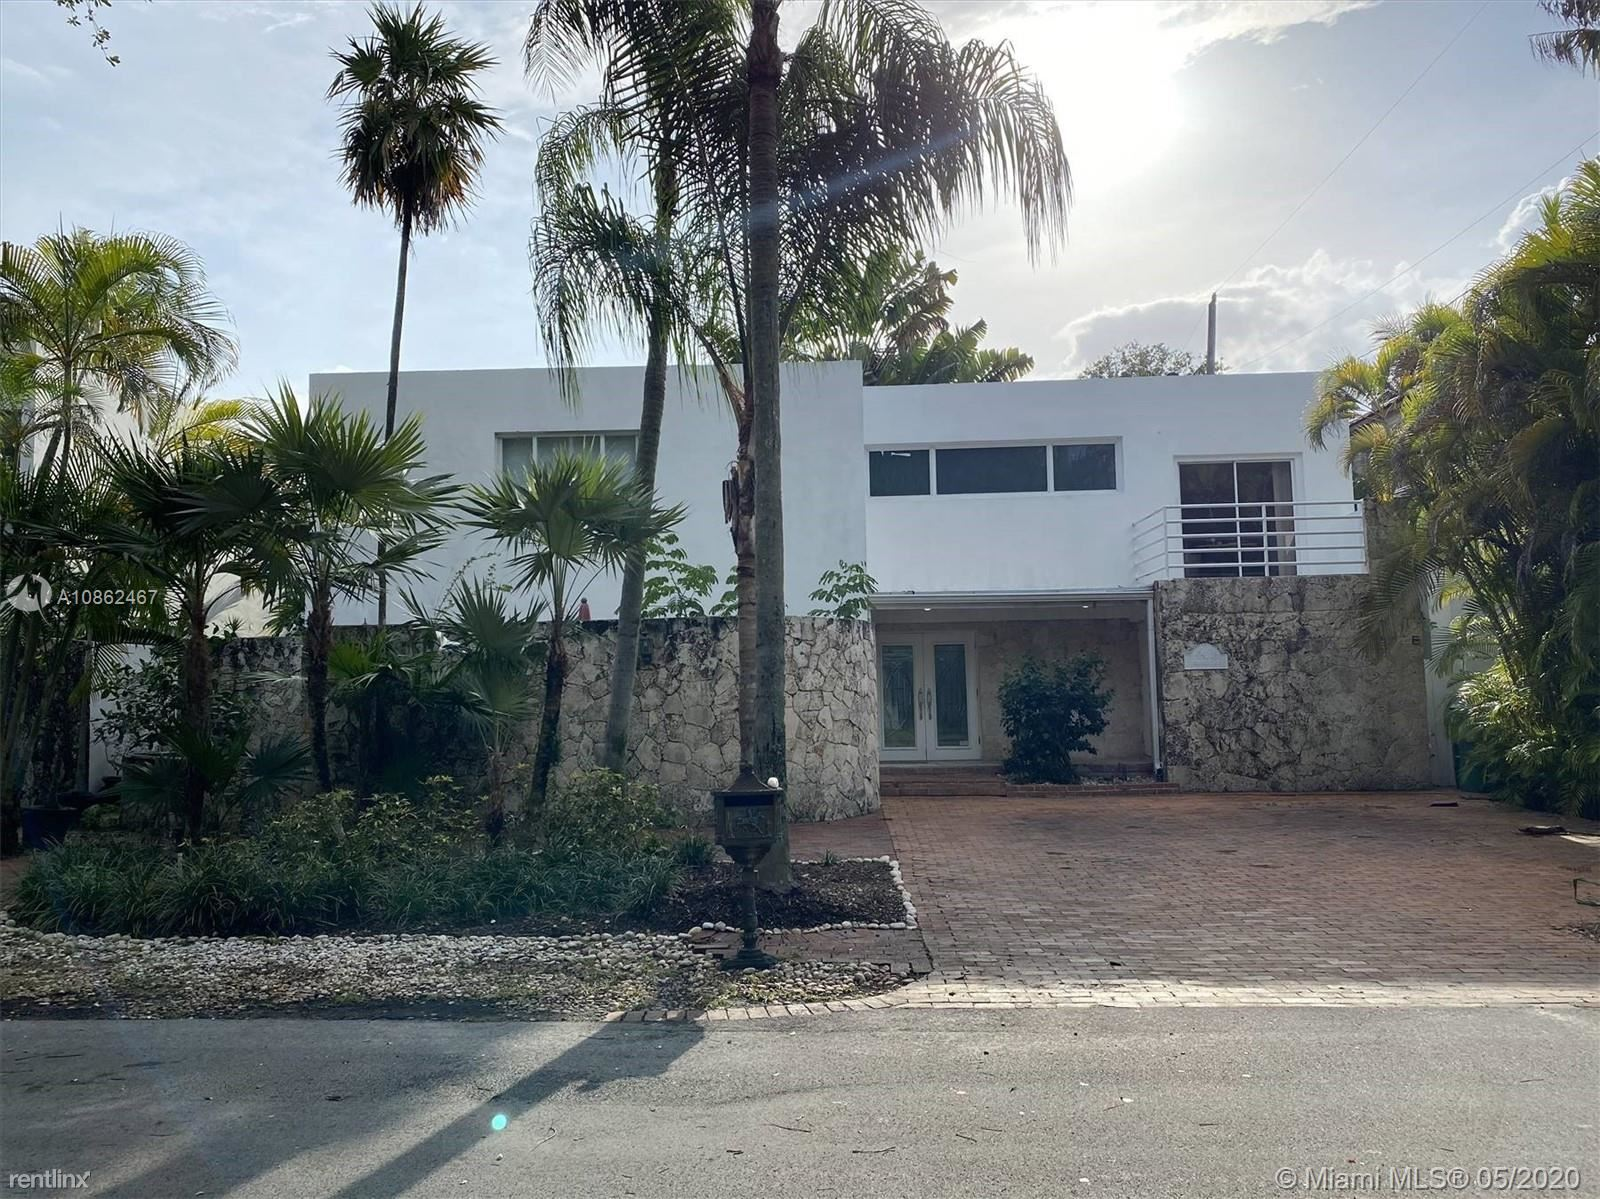 4410 Brighton Pl, Miami, FL - $6,500